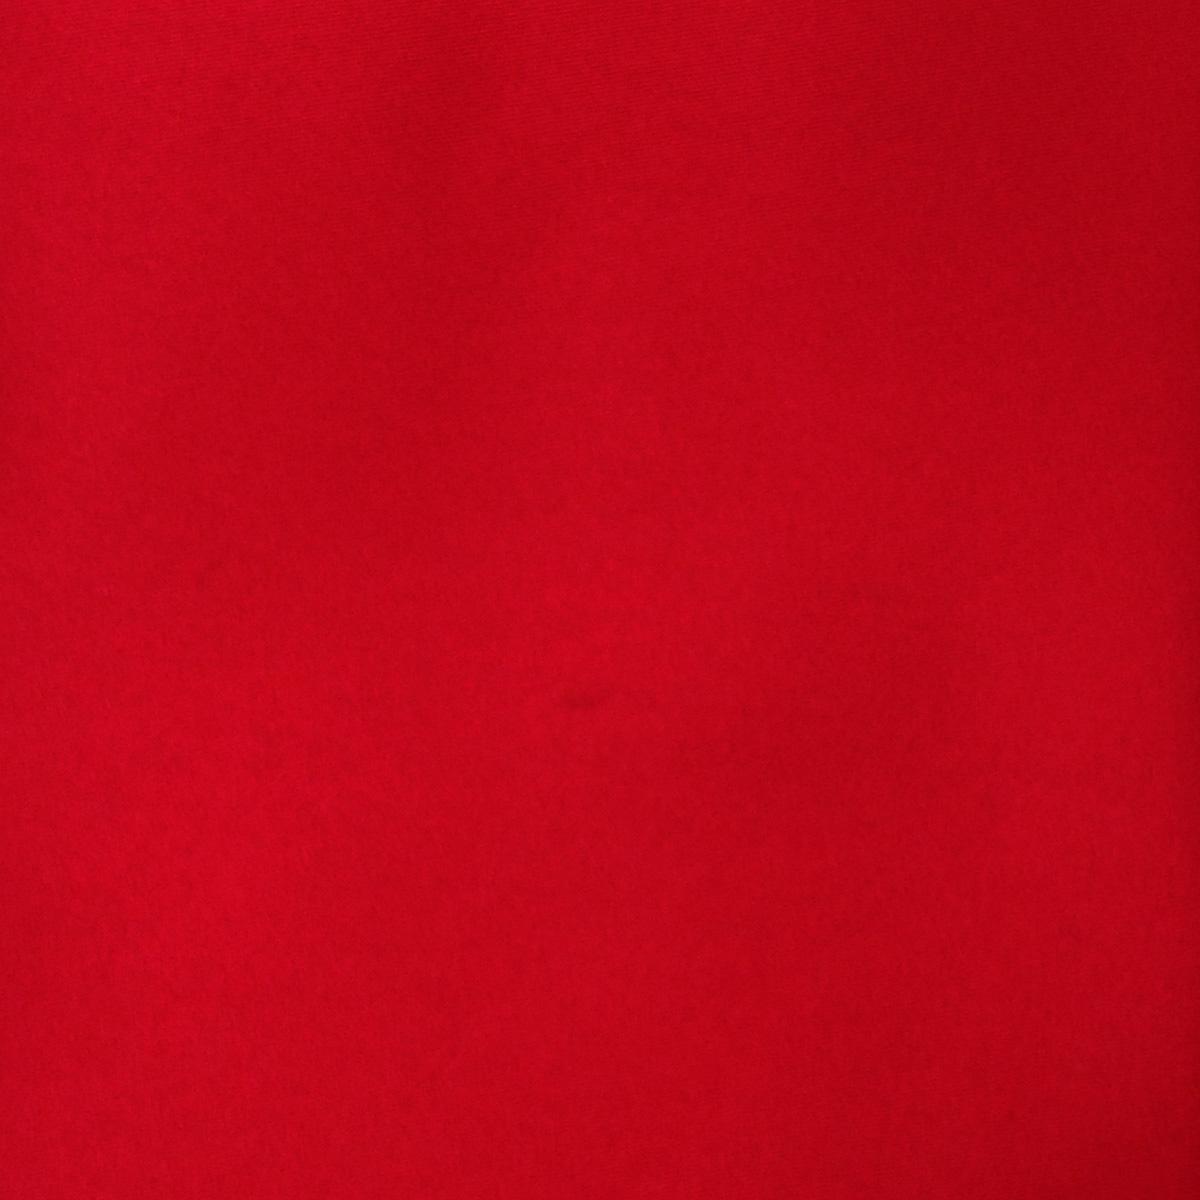 B1764 02 red mens ties facemasks con murphys menswear cork - - Con Murphys Menswear